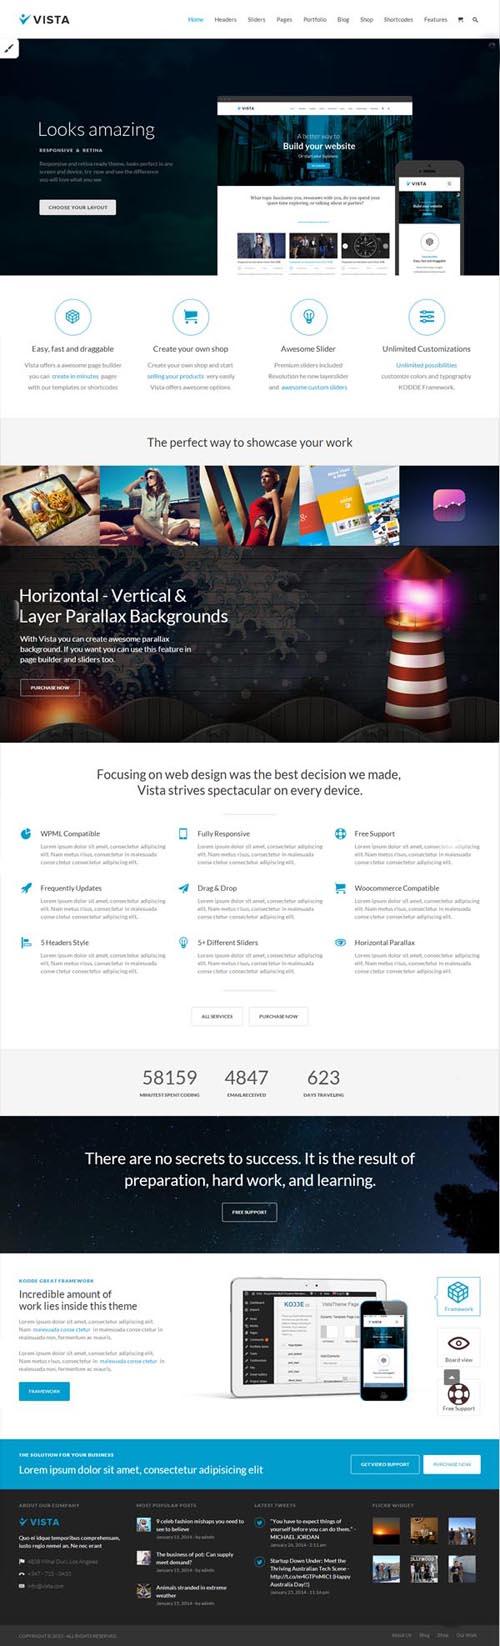 Vista - Responsive Multi-Purpose WordPress Theme